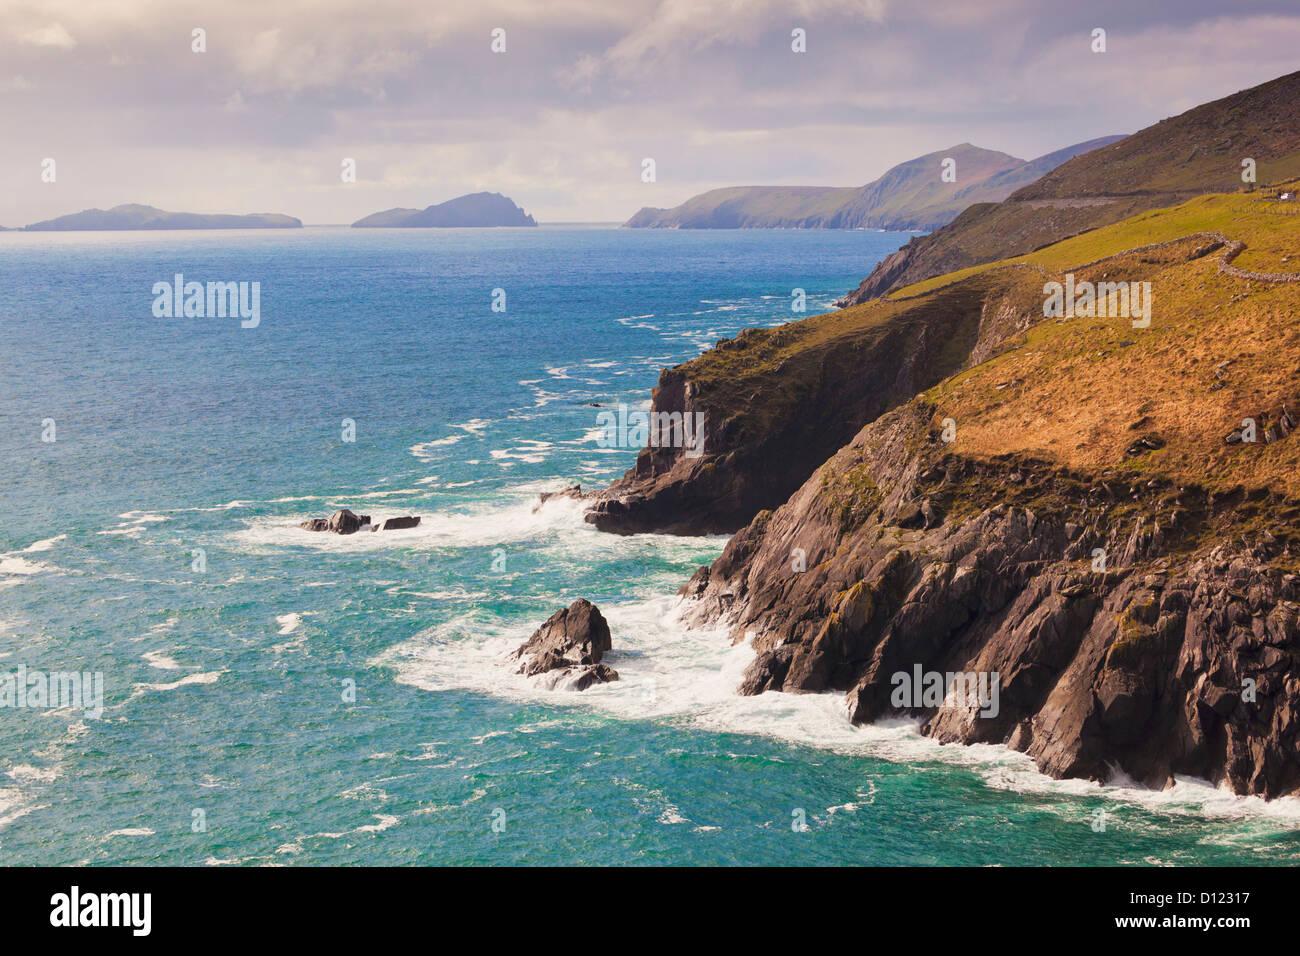 View Along The Coast To Blasket Islands On The Horizon Near Slea Head; Dingle Peninsula County Kerry Ireland Stock Photo